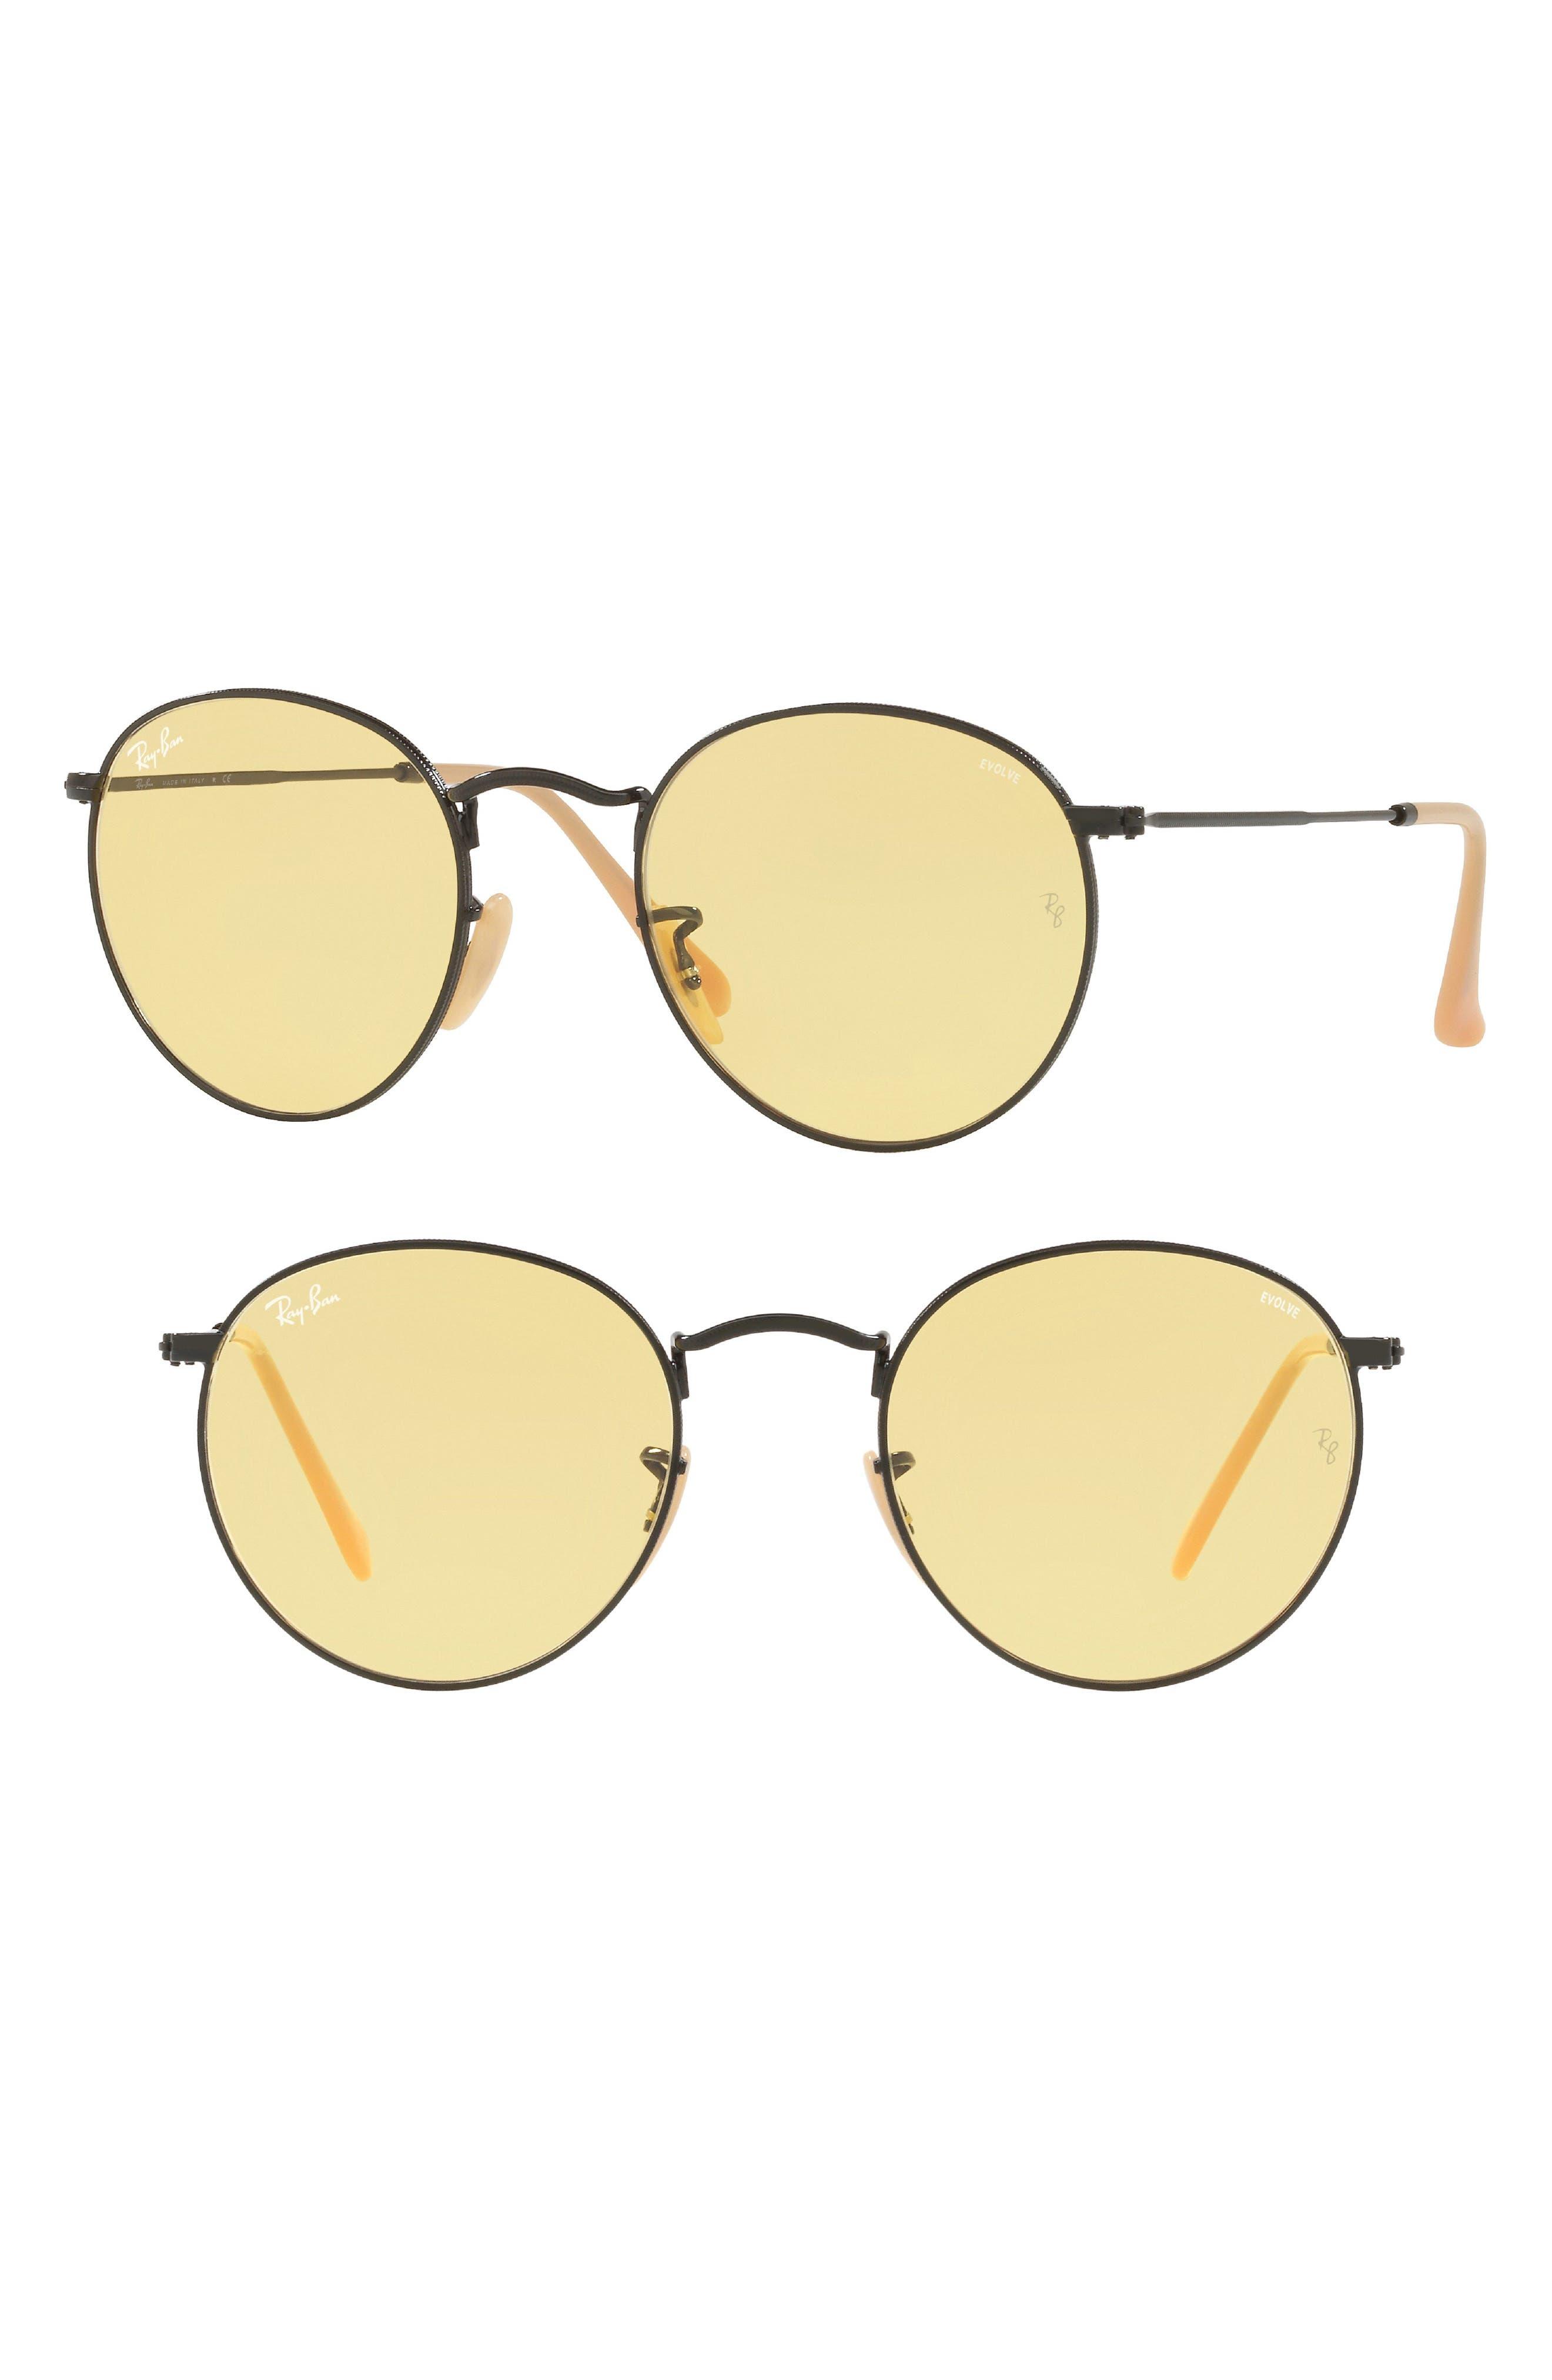 53mm Polarized Round Sunglasses,                         Main,                         color, 016